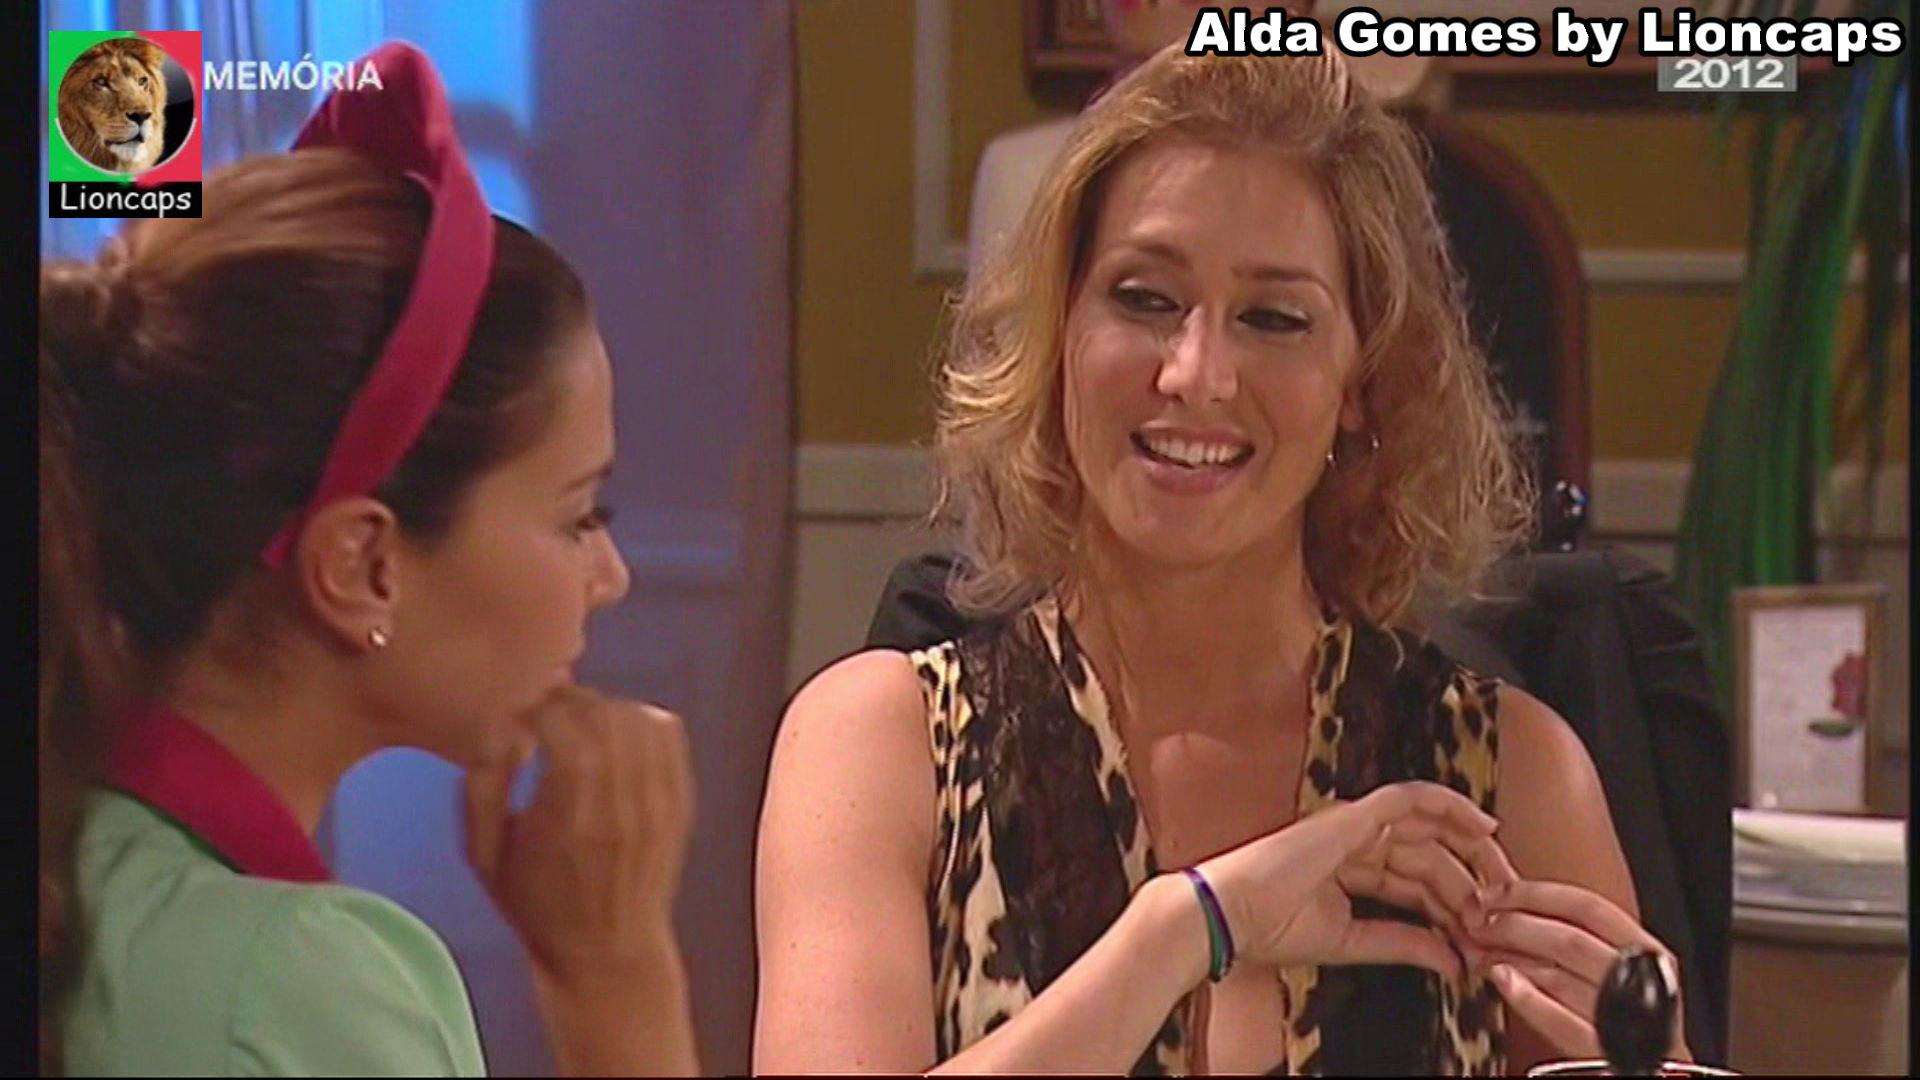 995552647_alda_gomes_vs181228_0244_122_54lo.JPG